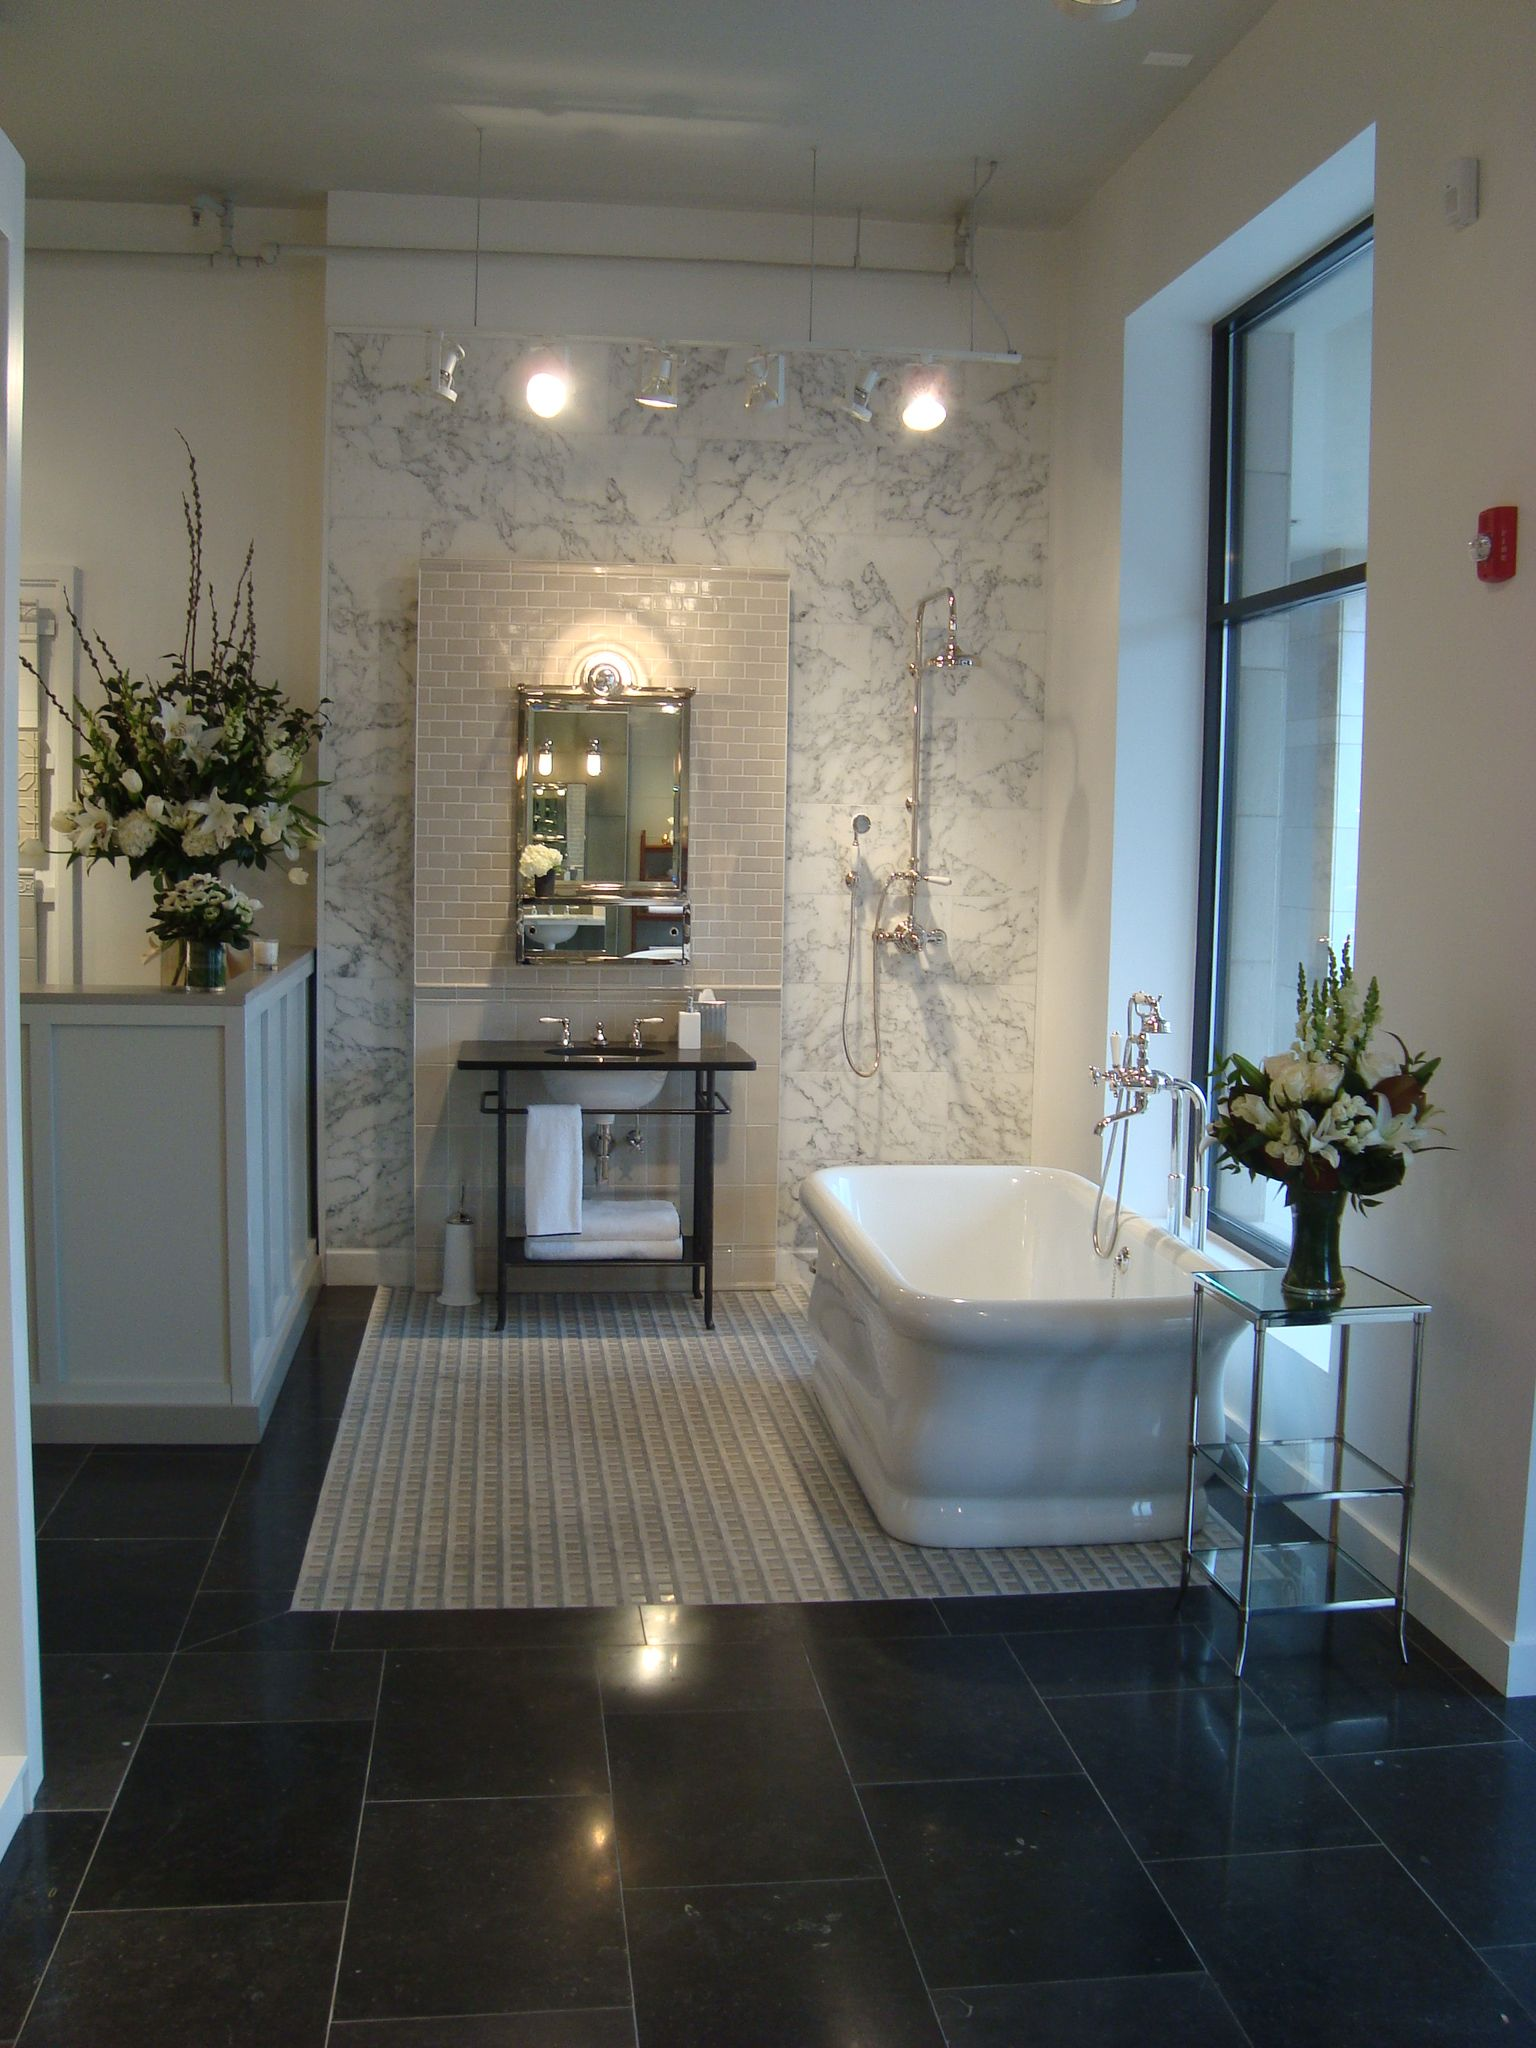 Pin By Waterworks On Bathrooms Modern Bathroom Tile Glass Bathroom Designs Luxury Bathroom Faucets